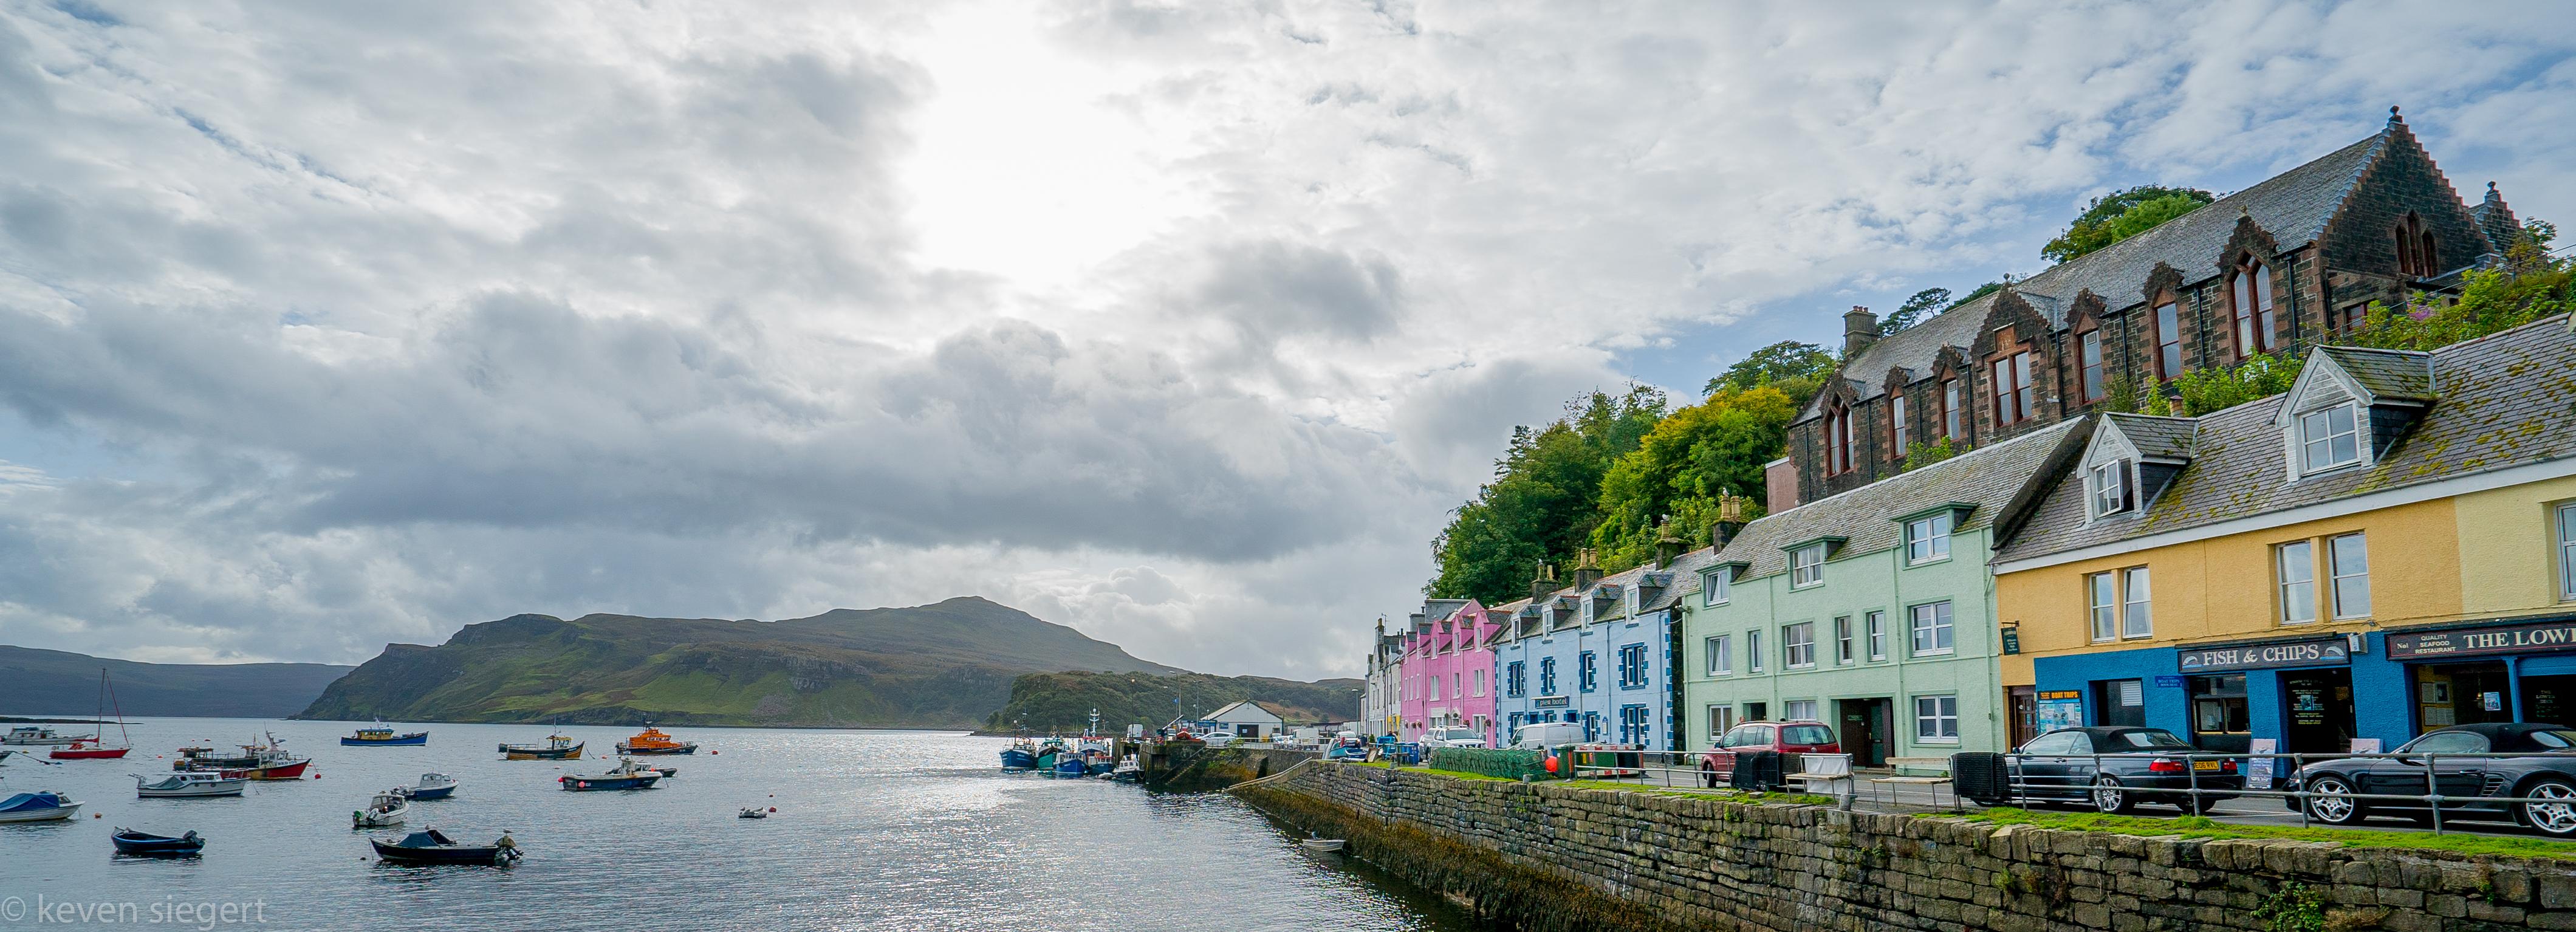 Portree - Isle of Skye, Scotland